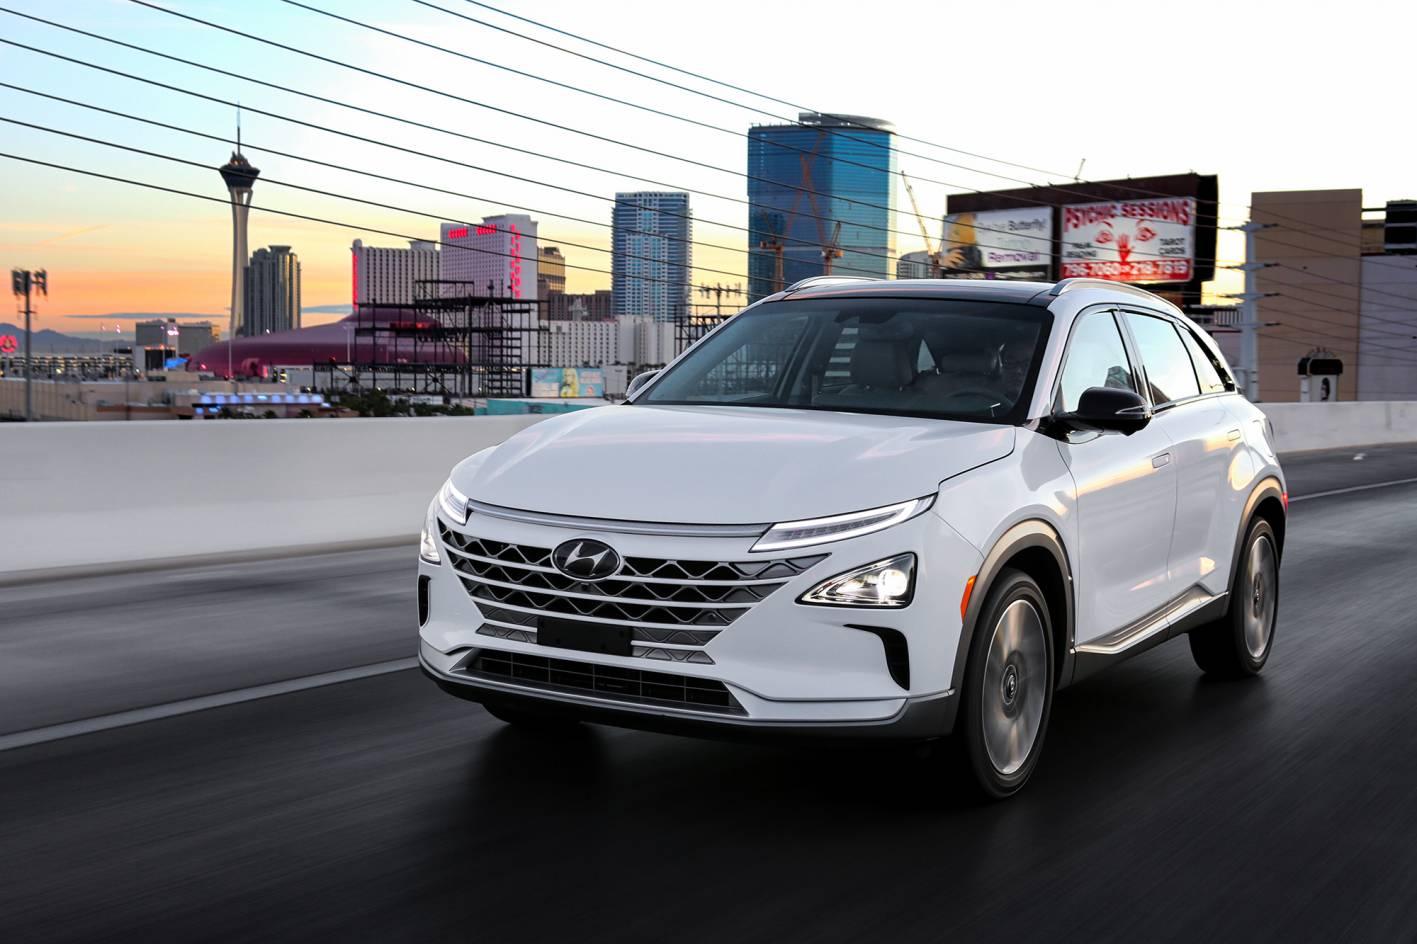 Hyundai Unveils NEXO Fuel Cell Vehicle With 800km Range